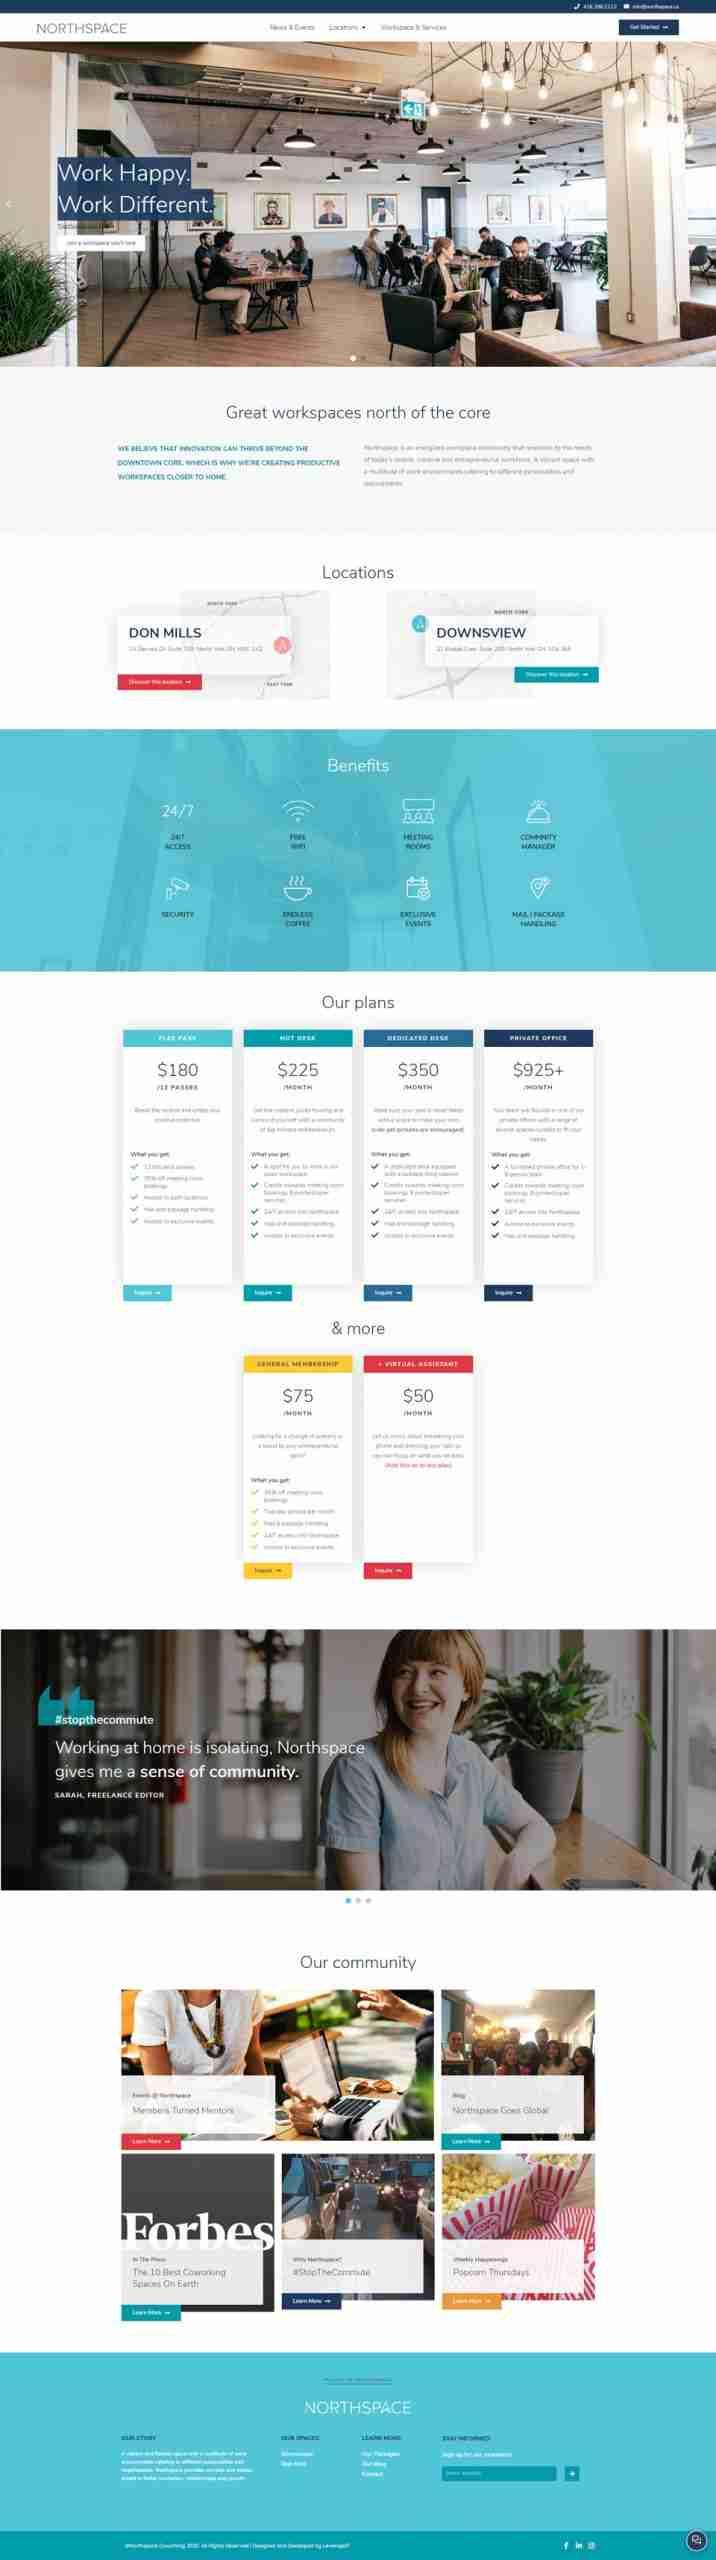 LeverageIT Northspace Website Image